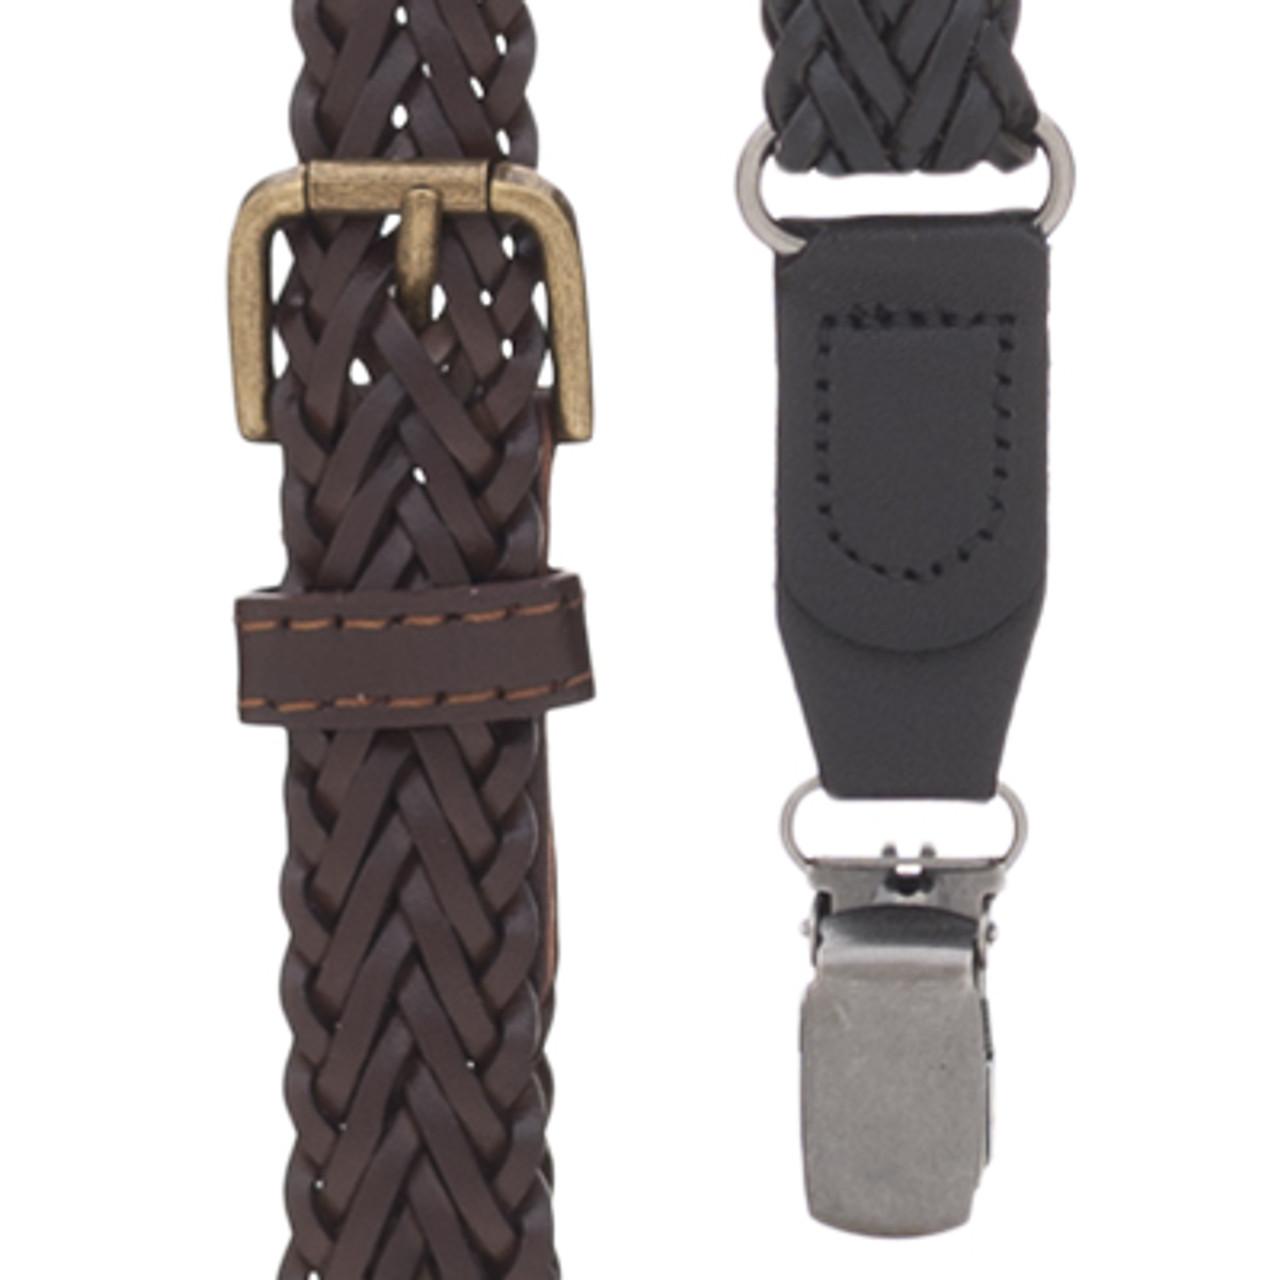 Button SuspenderStore Mens Herringbone Braided Leather Suspenders